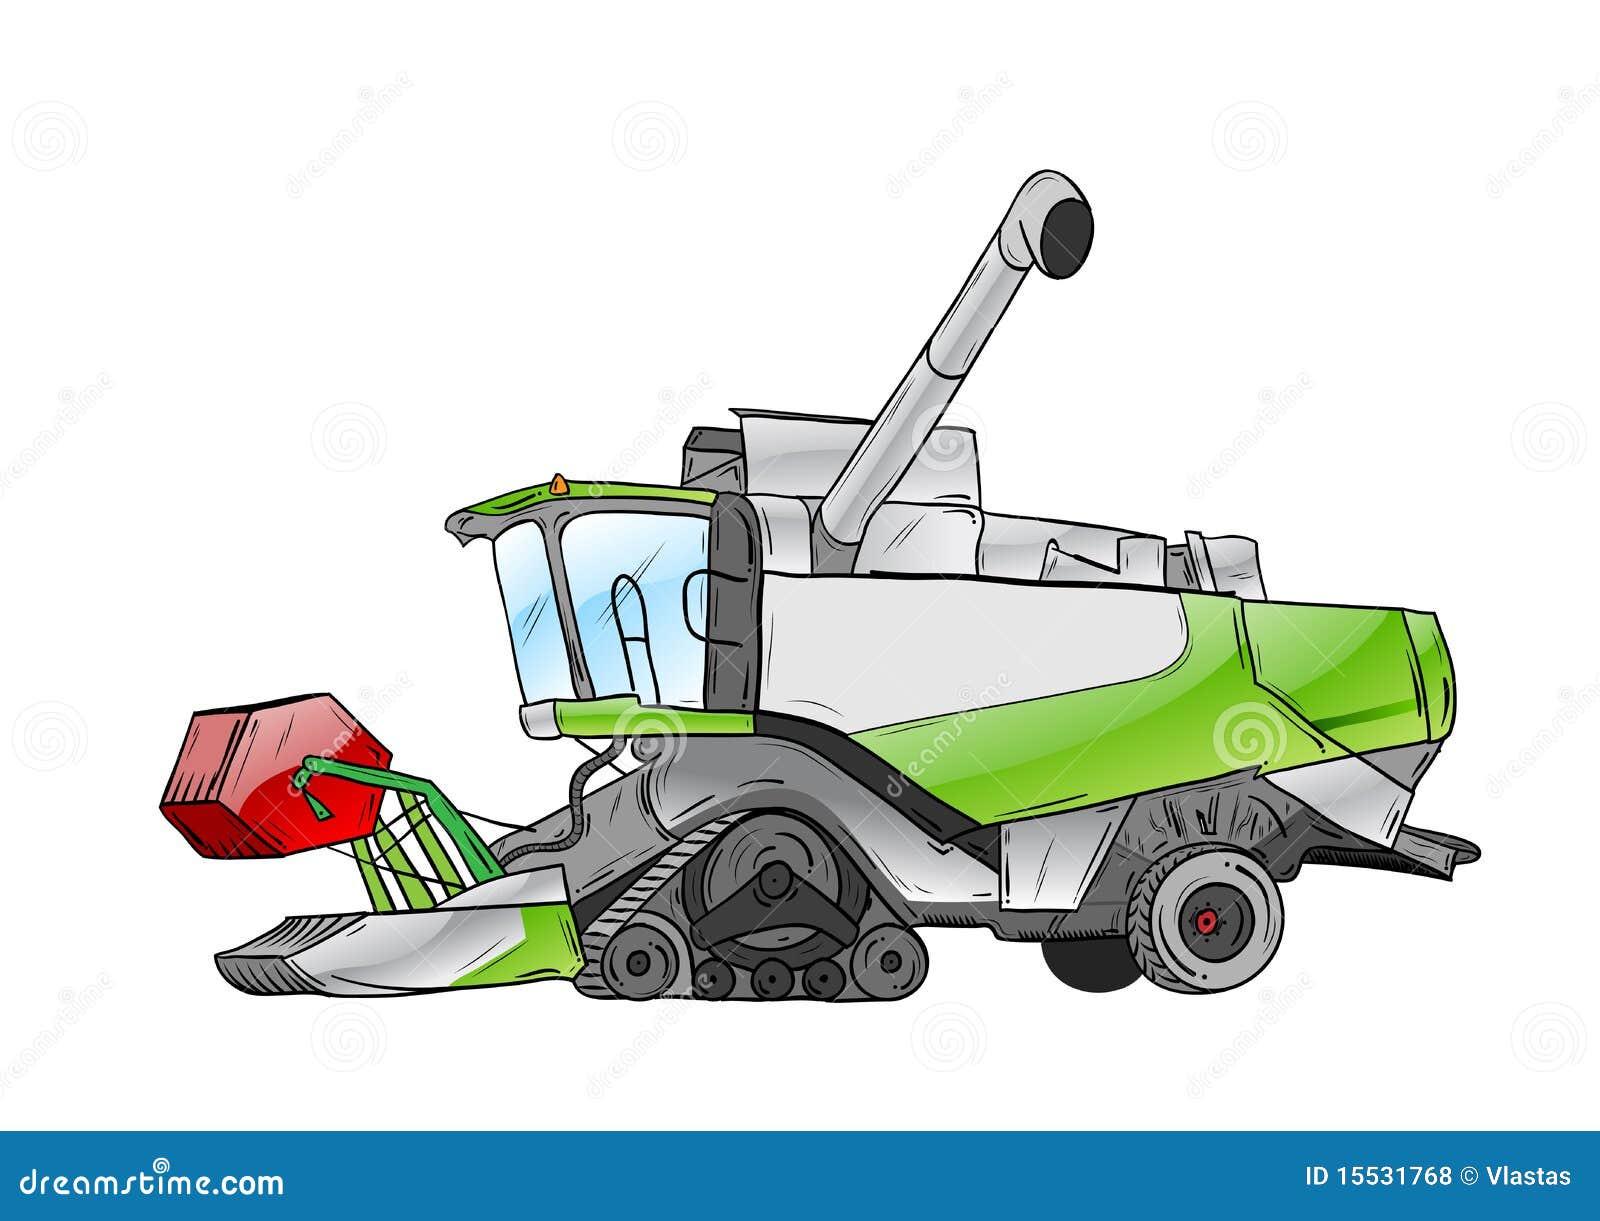 Tractor Cartoon Picker : Harvester royalty free stock photos image